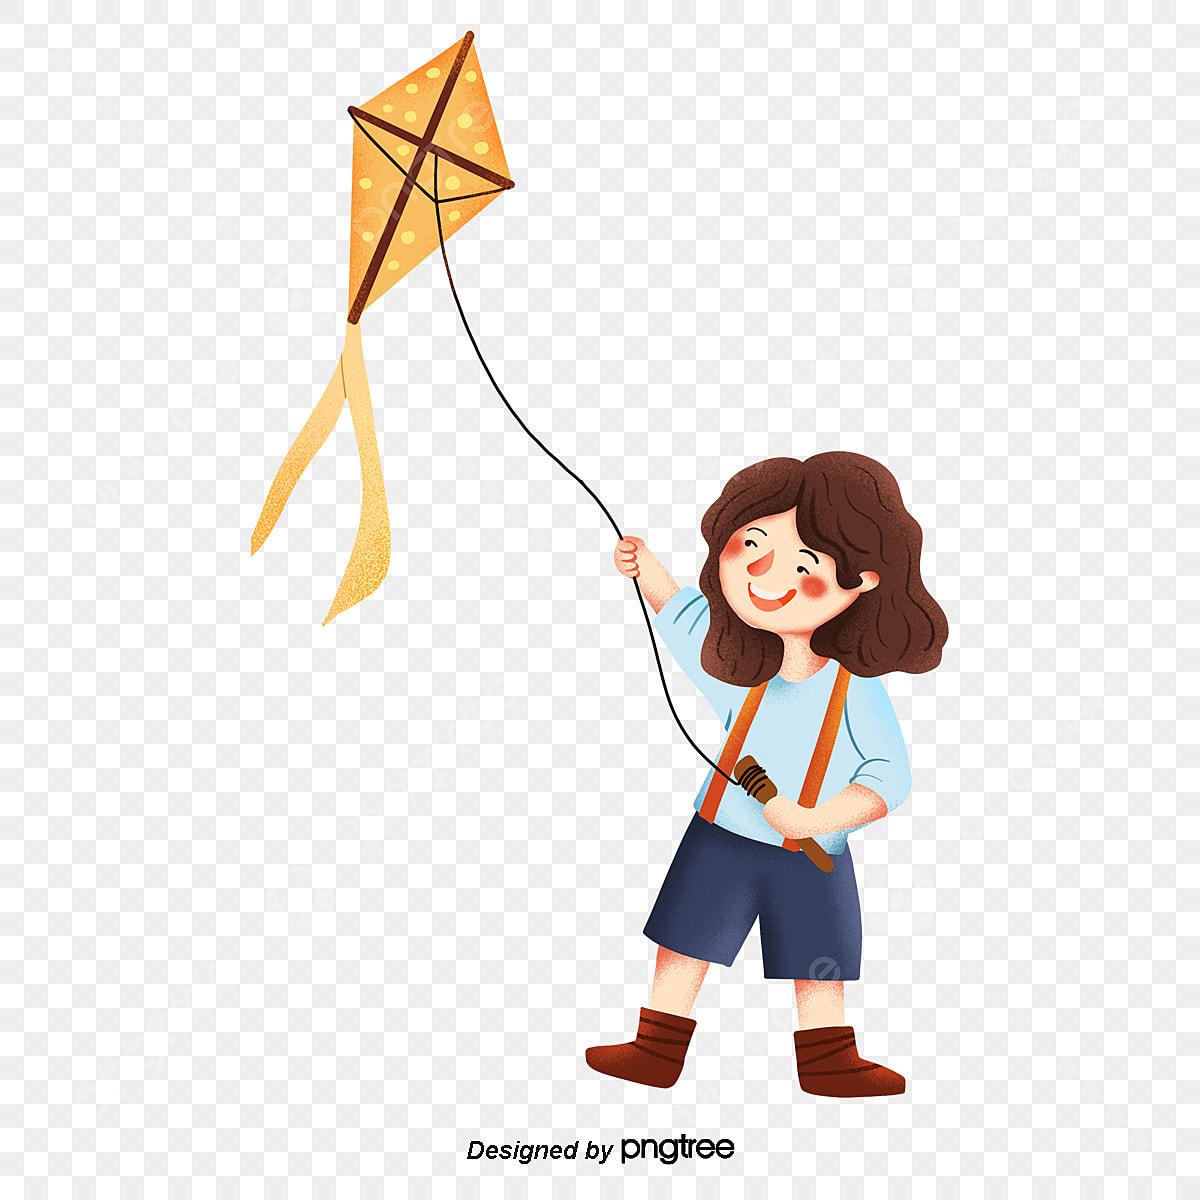 Cartoon Girls Fly Kites Element Lovely Girl Png Transparent